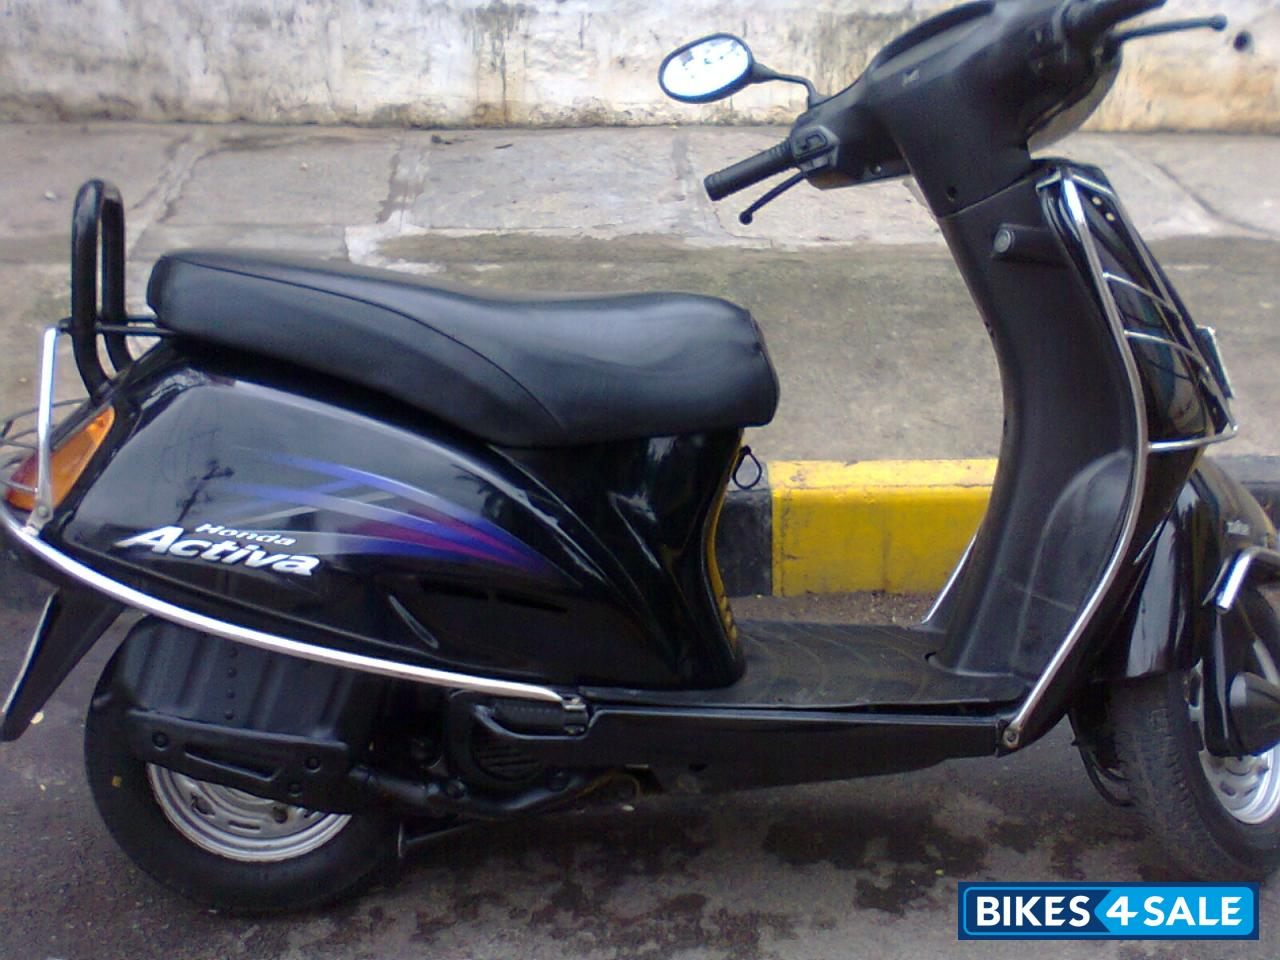 Activa in Bangalore. The honda activa 100cc black colour of 2009 model ...